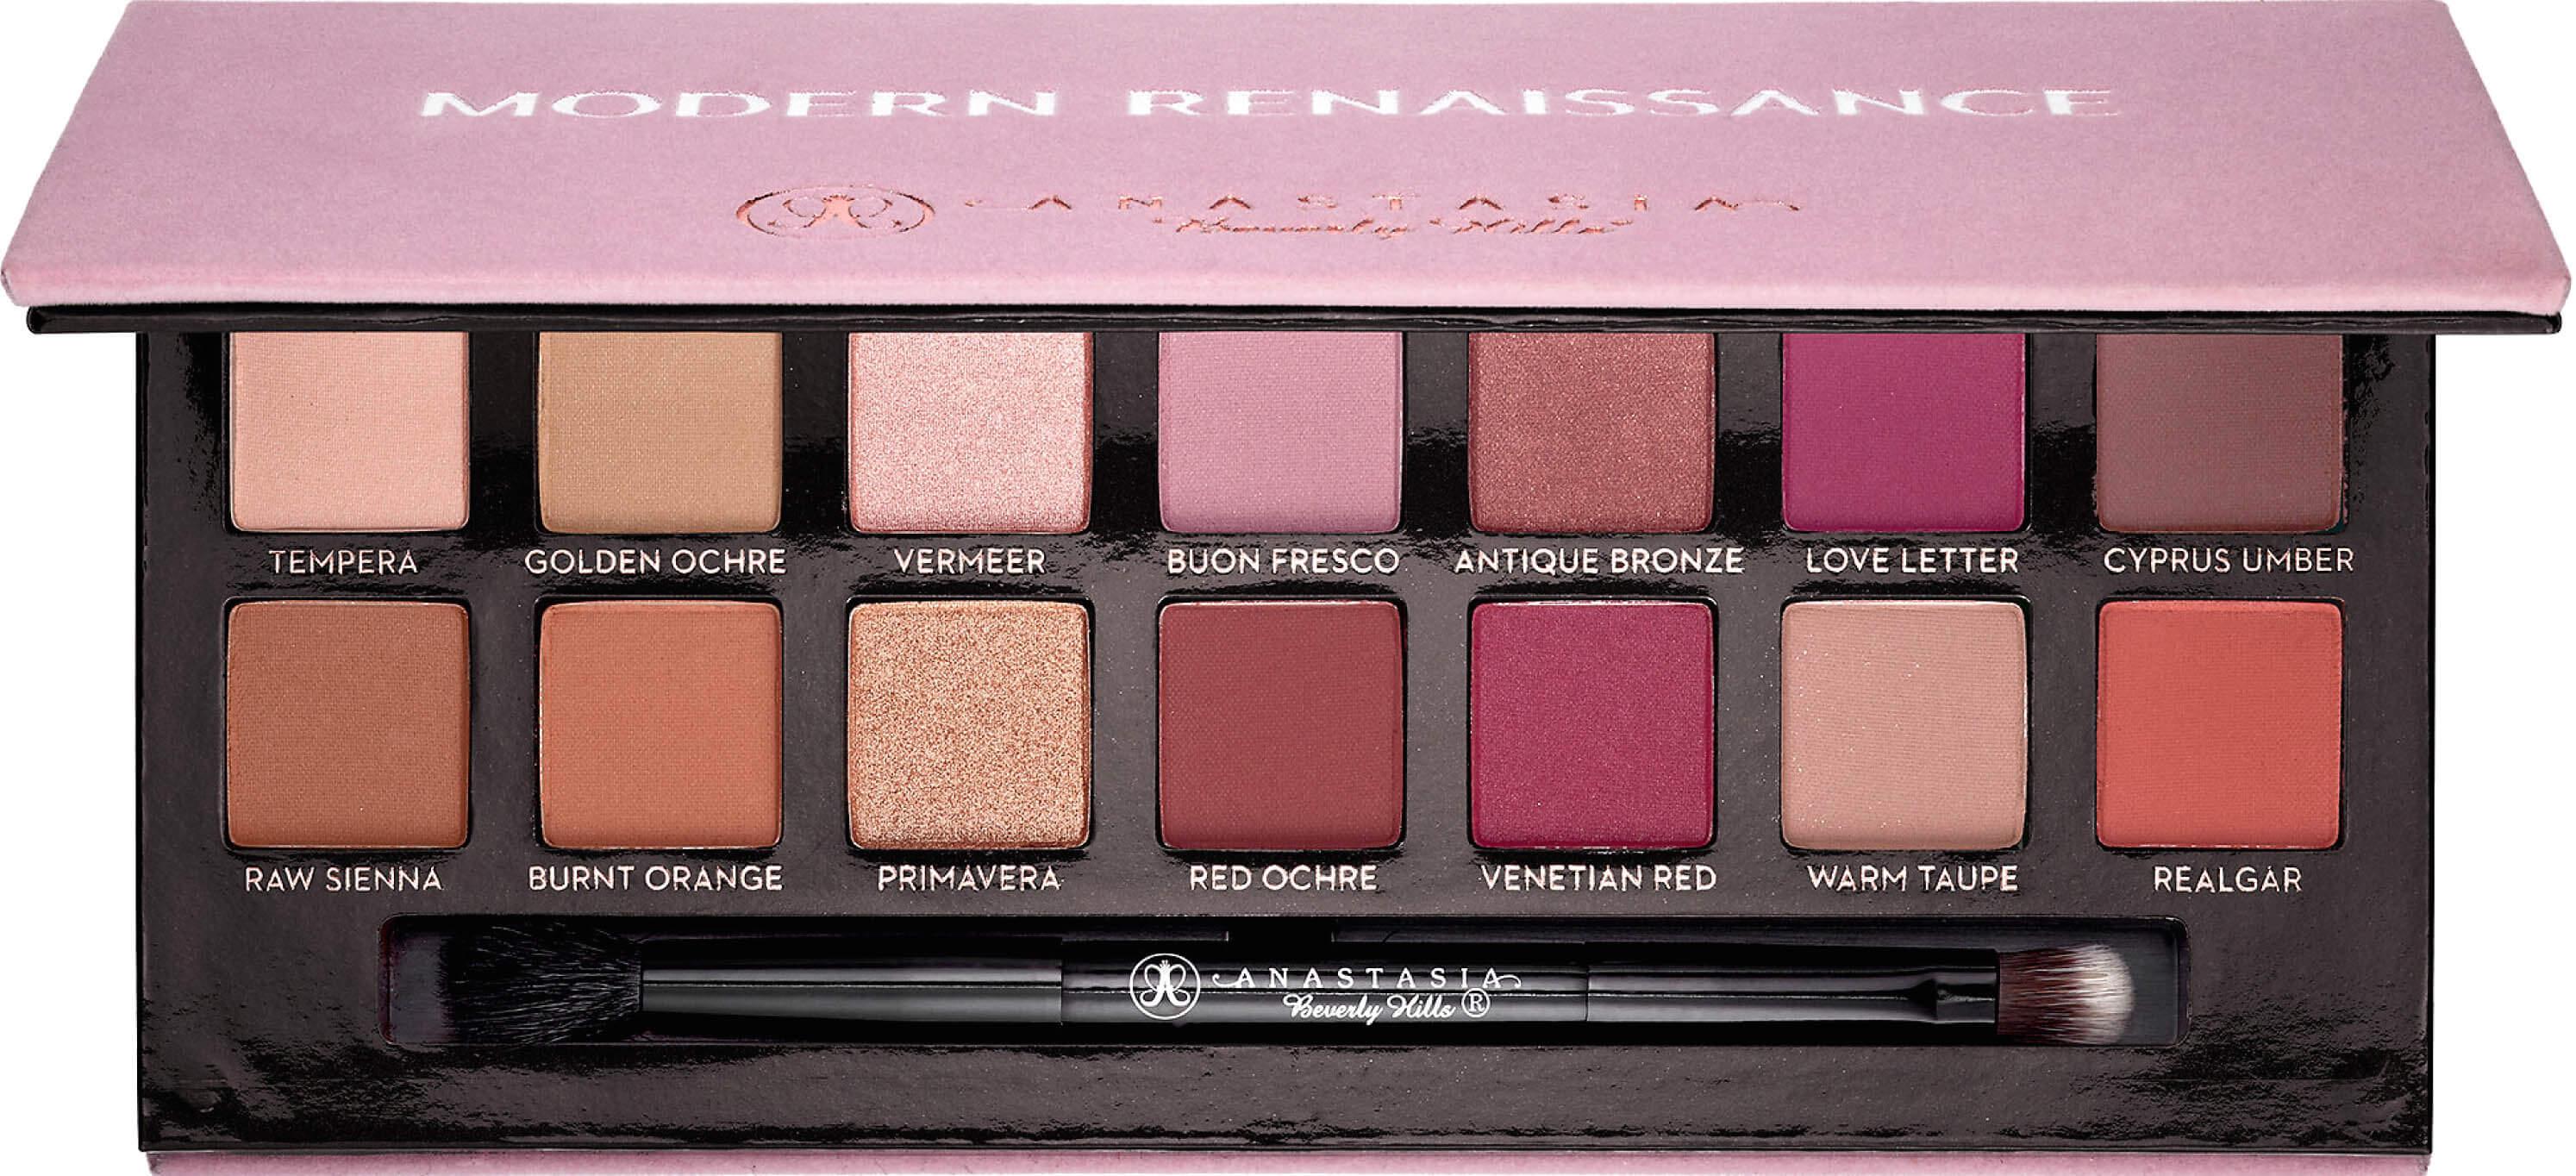 makeupbyazadig- anastasia beverly hills - france - sephora - liquid lipstick - modern renaissance - brow powder -modern